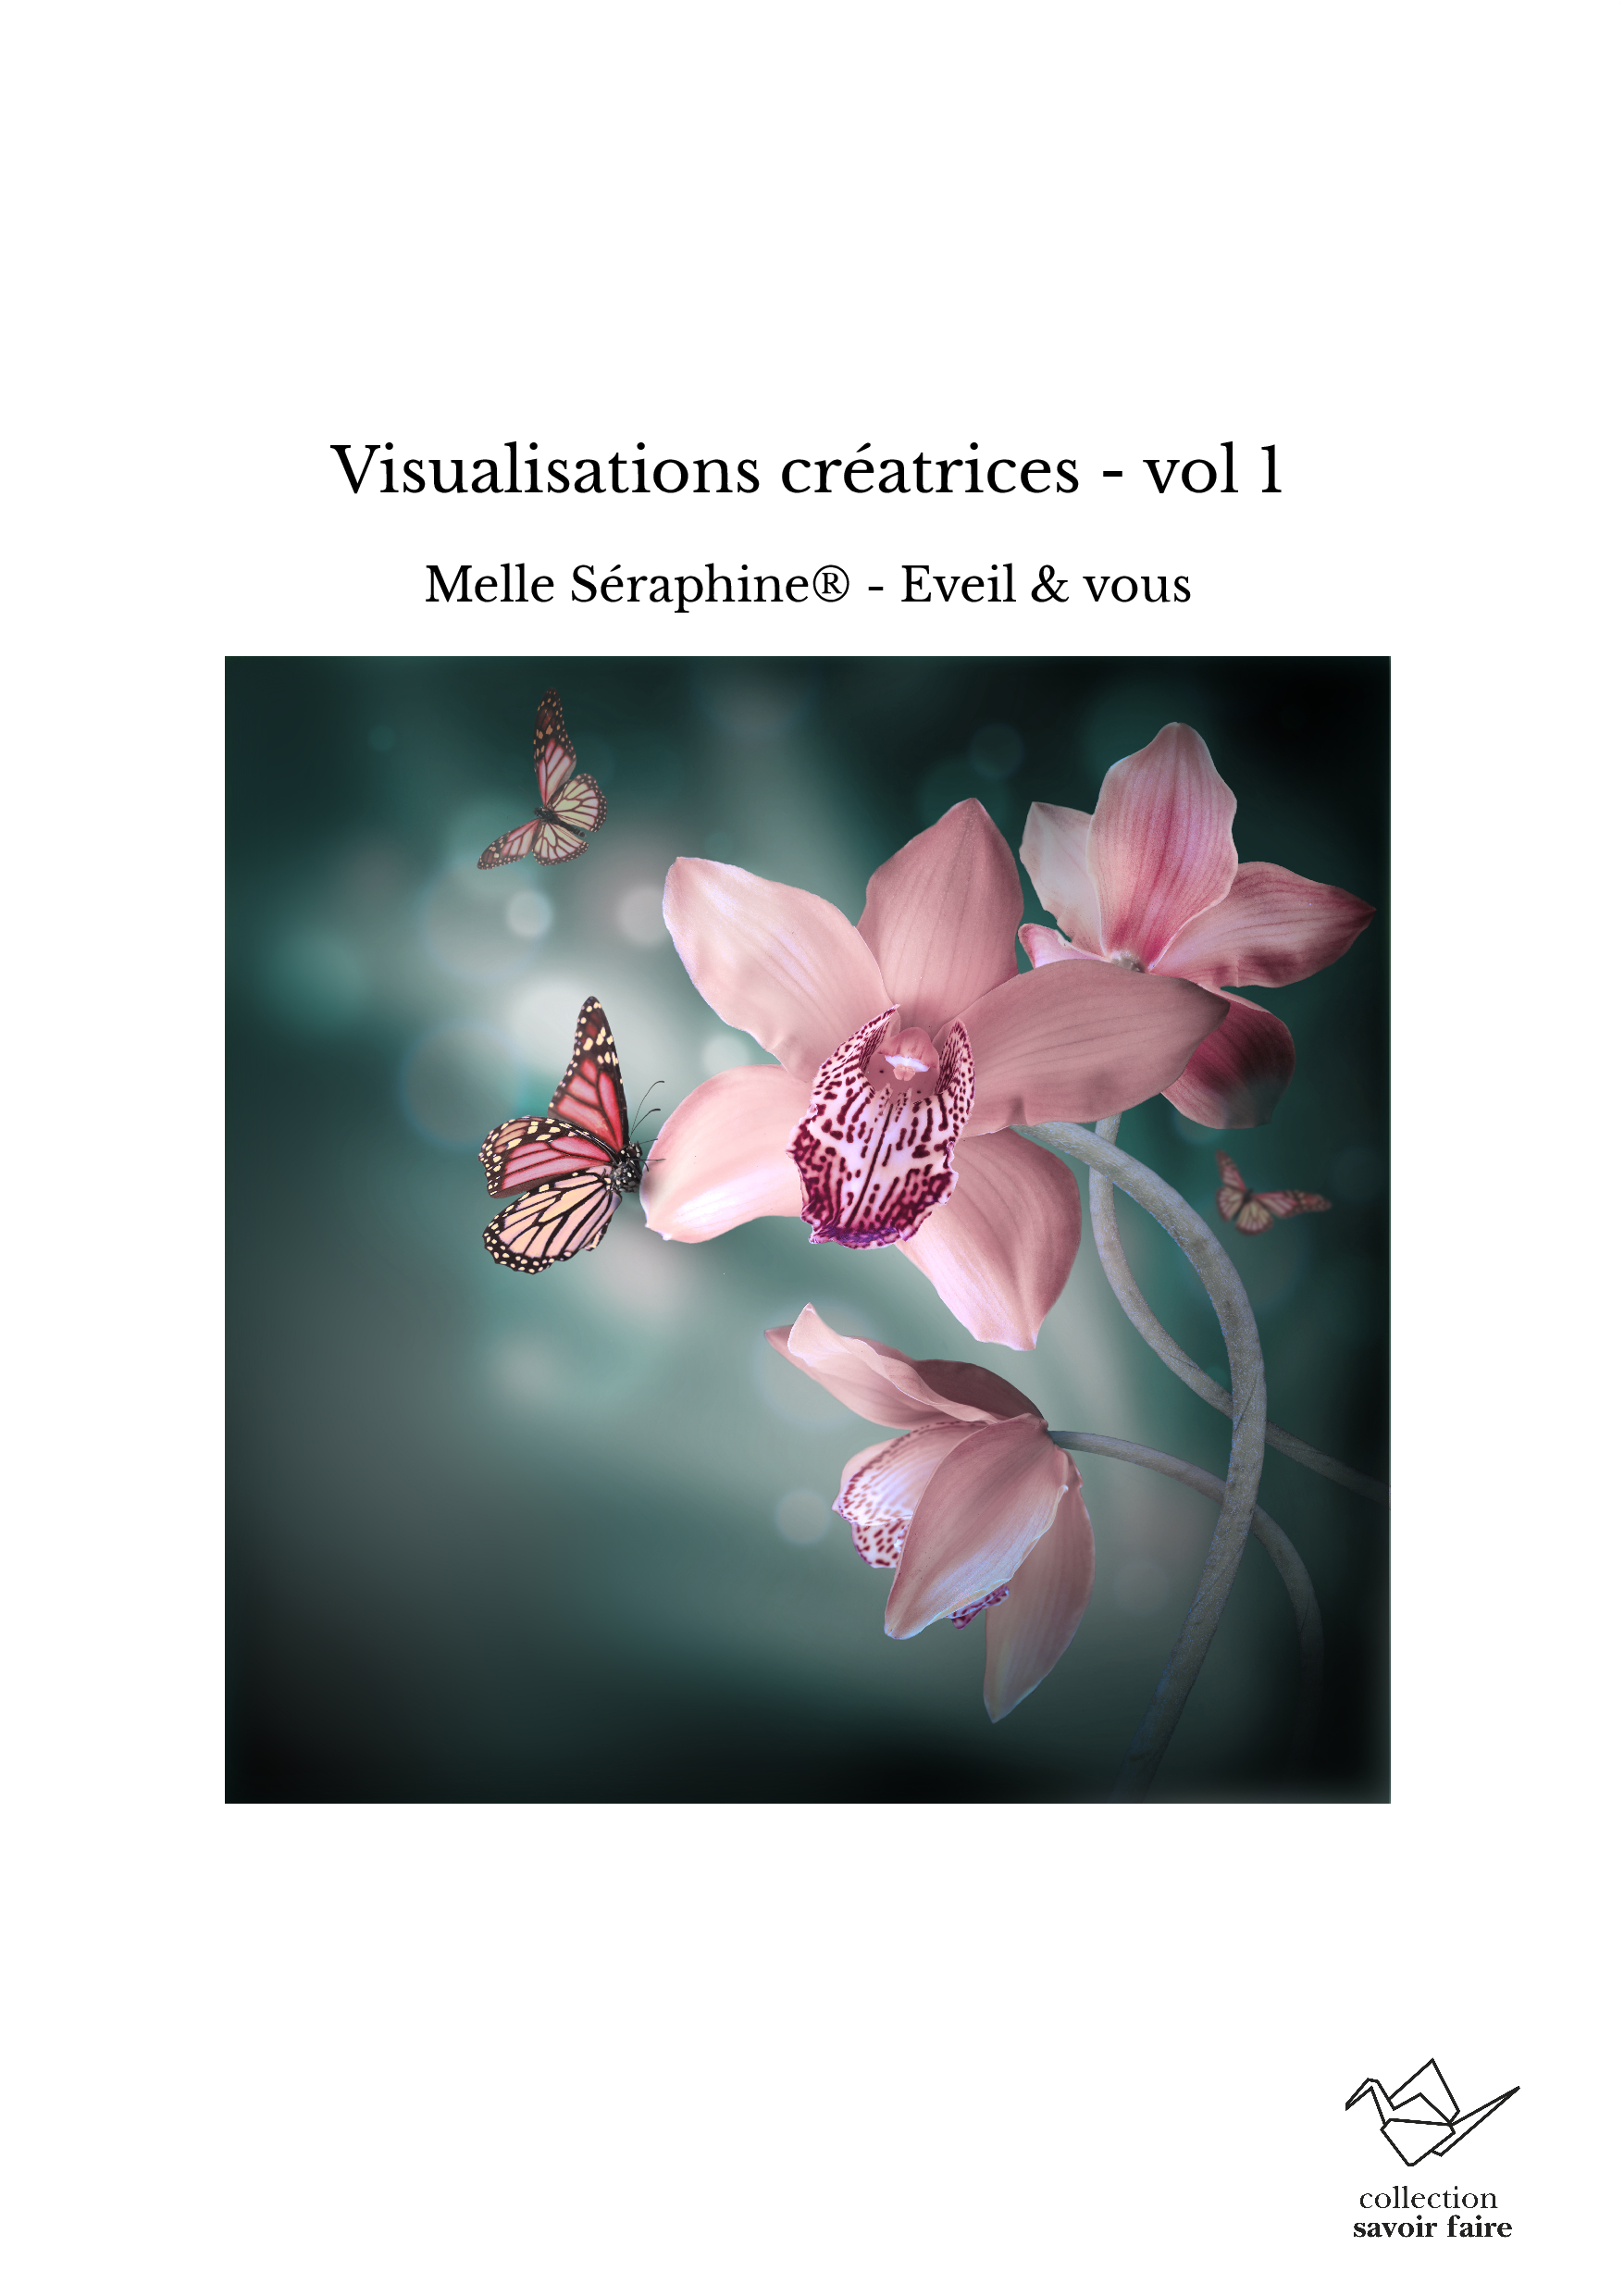 Visualisations créatrices - vol 1